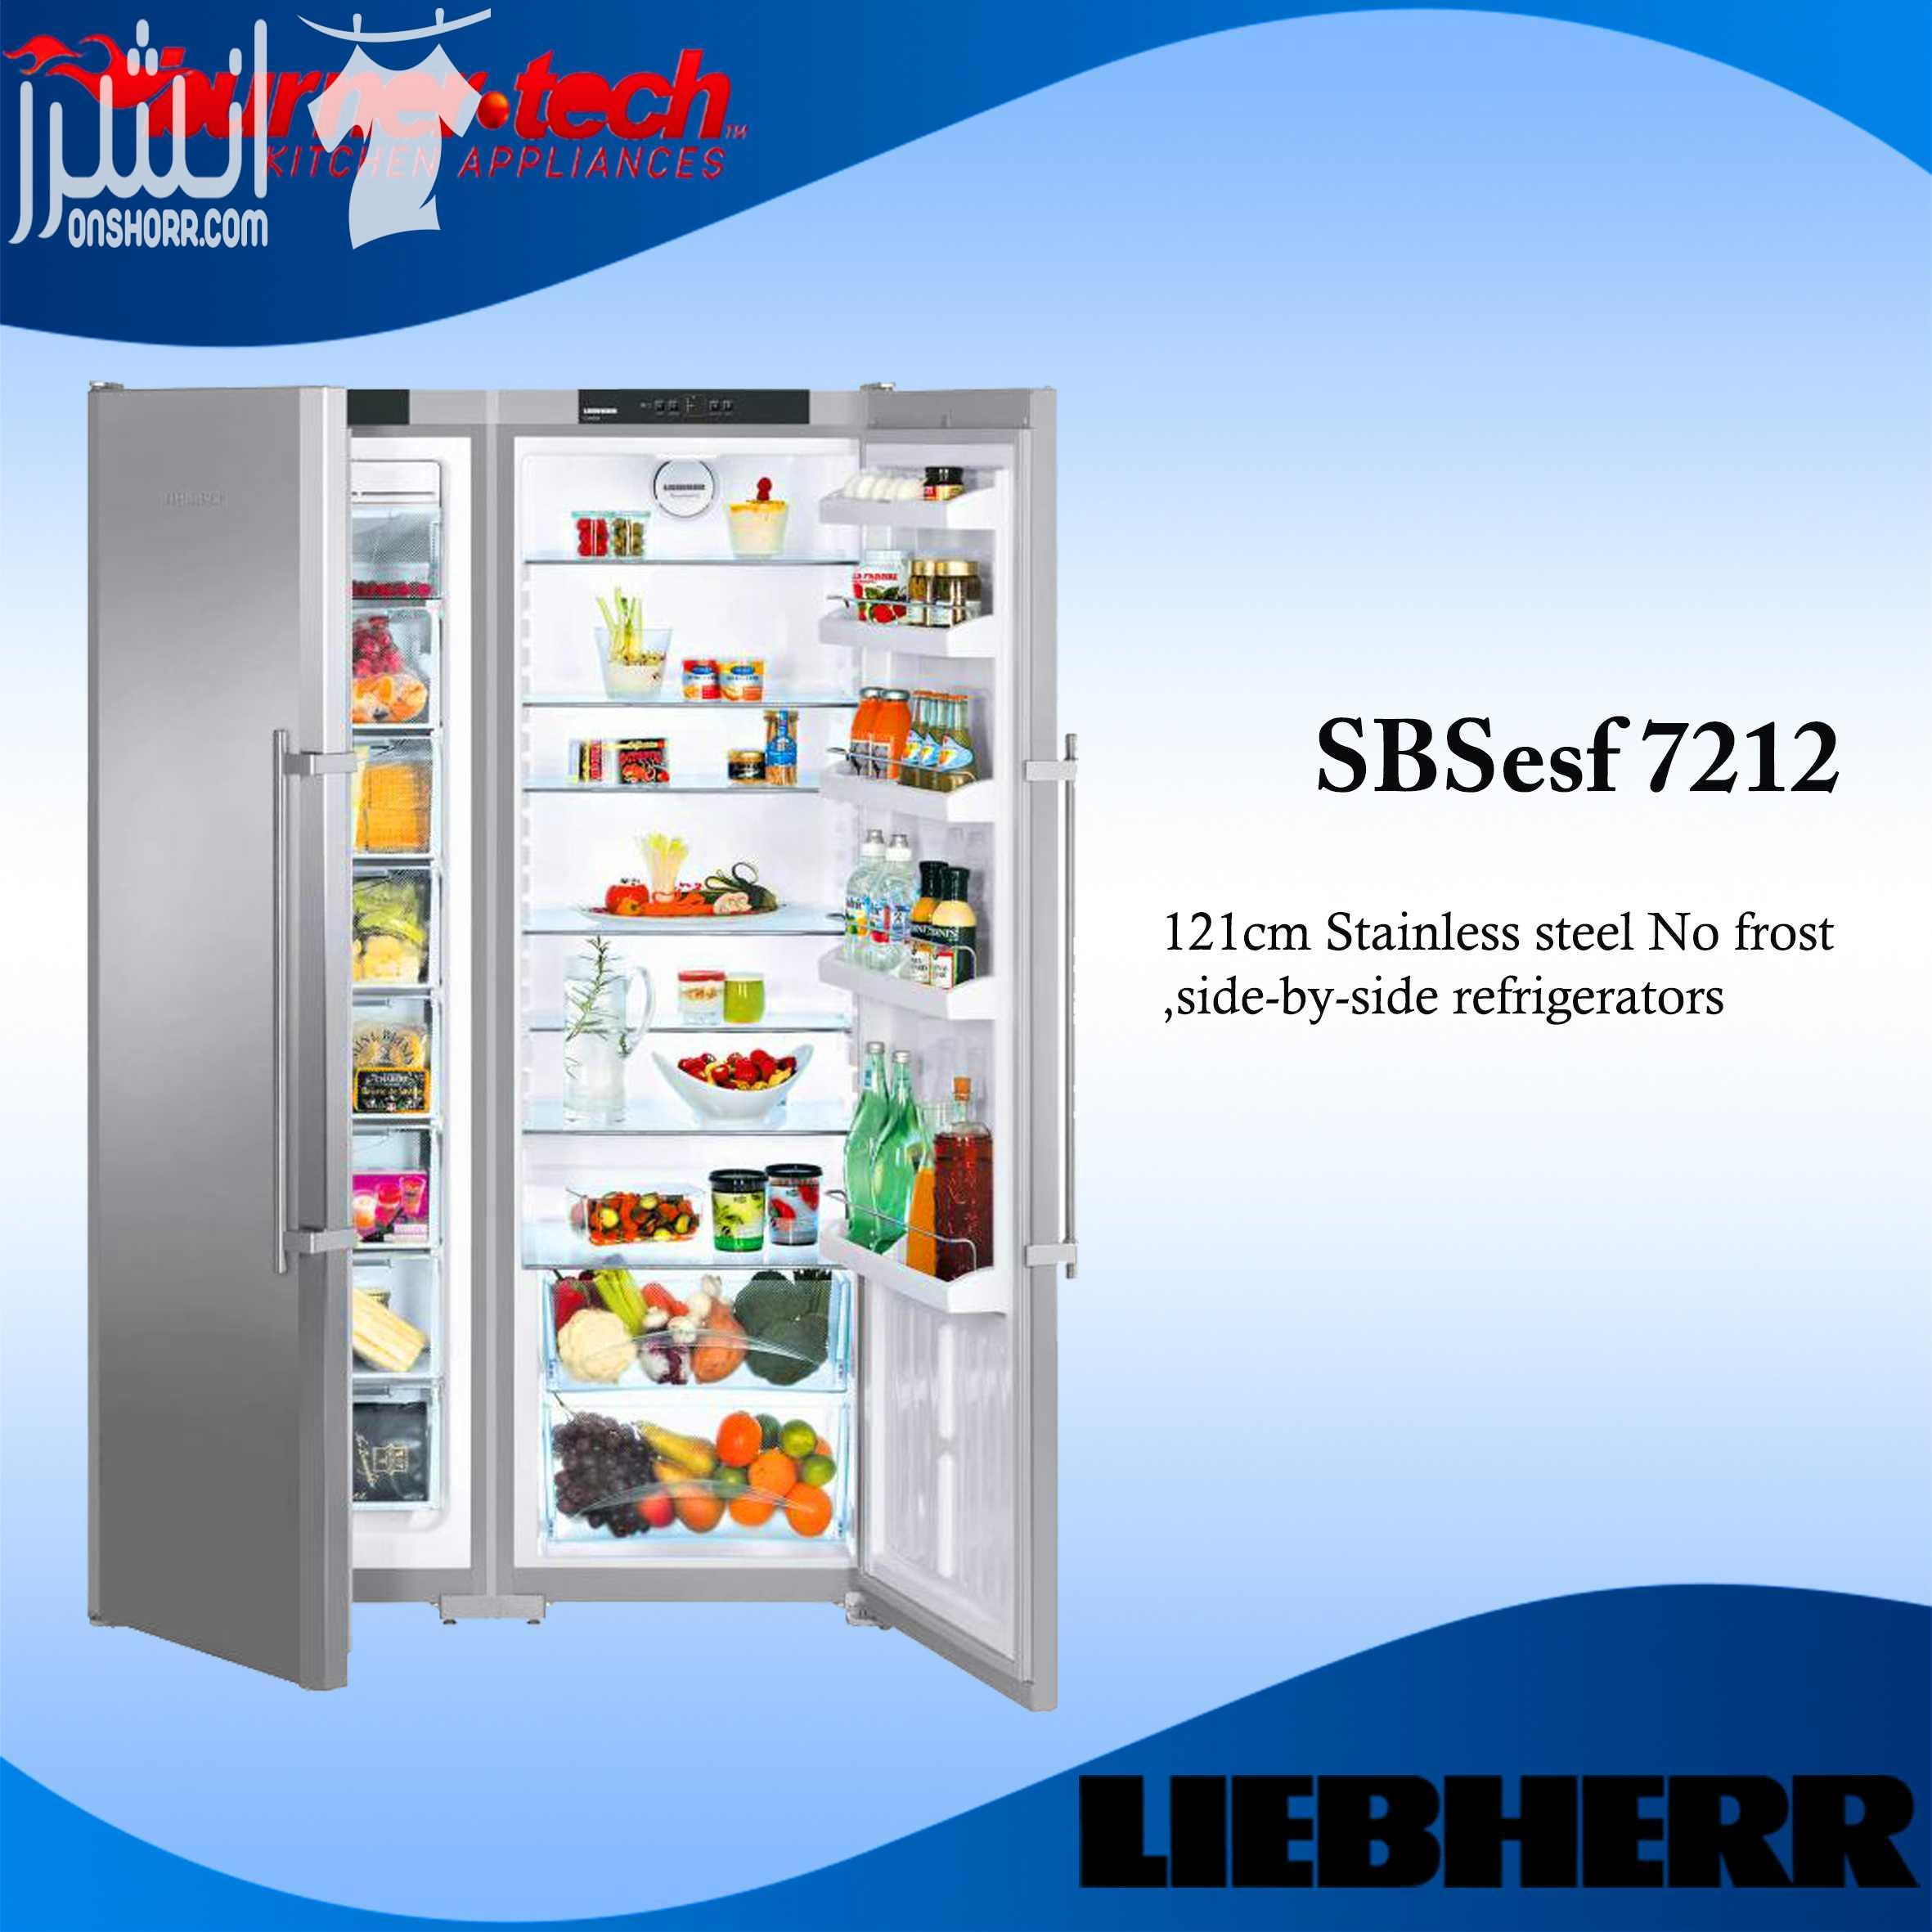 lg latest model fridge with 2doors side by side with water dispenser-  افضل تلاجة في الاجهزة...